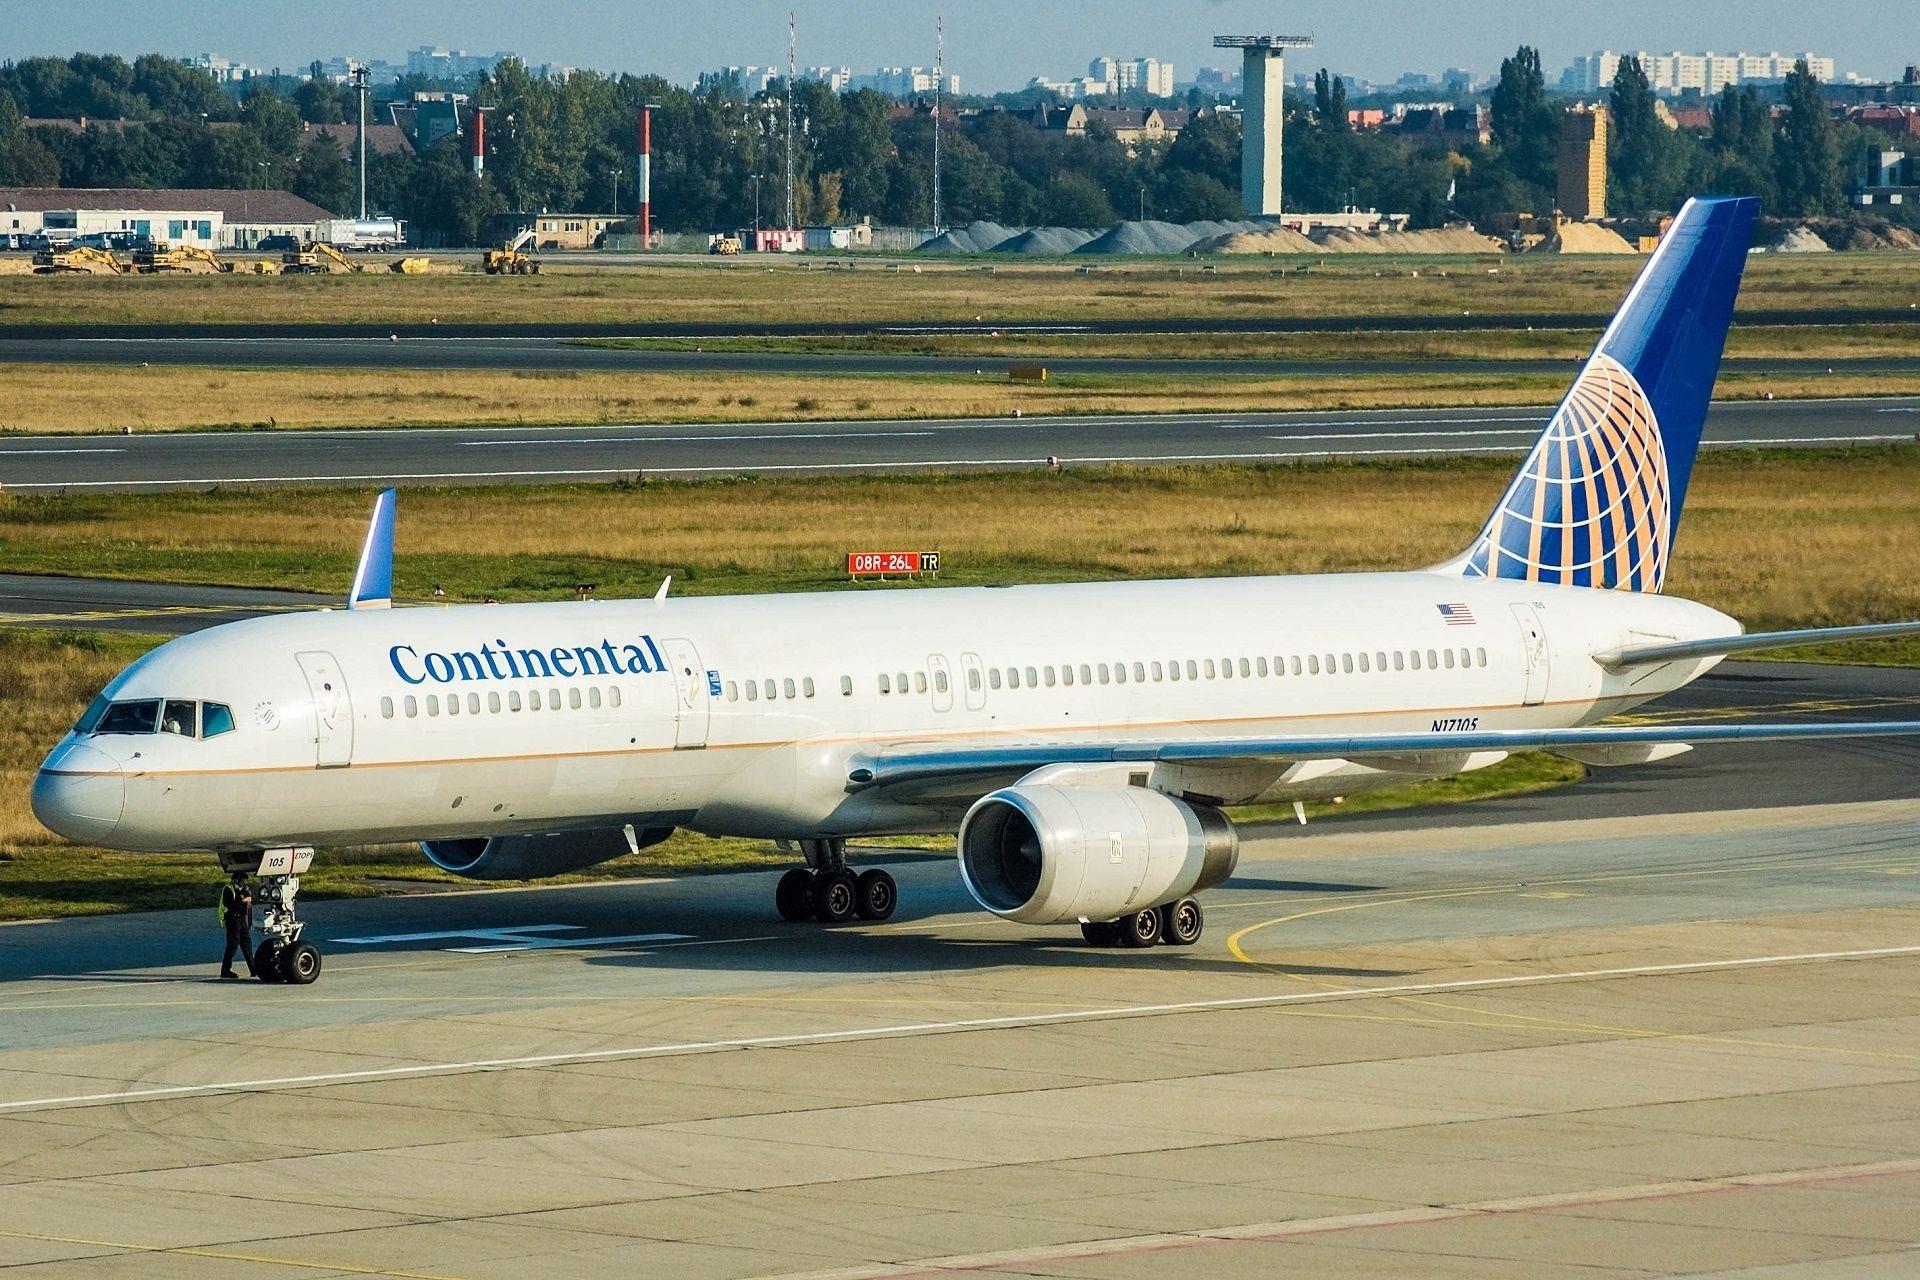 Continental Flugzeug - A320.